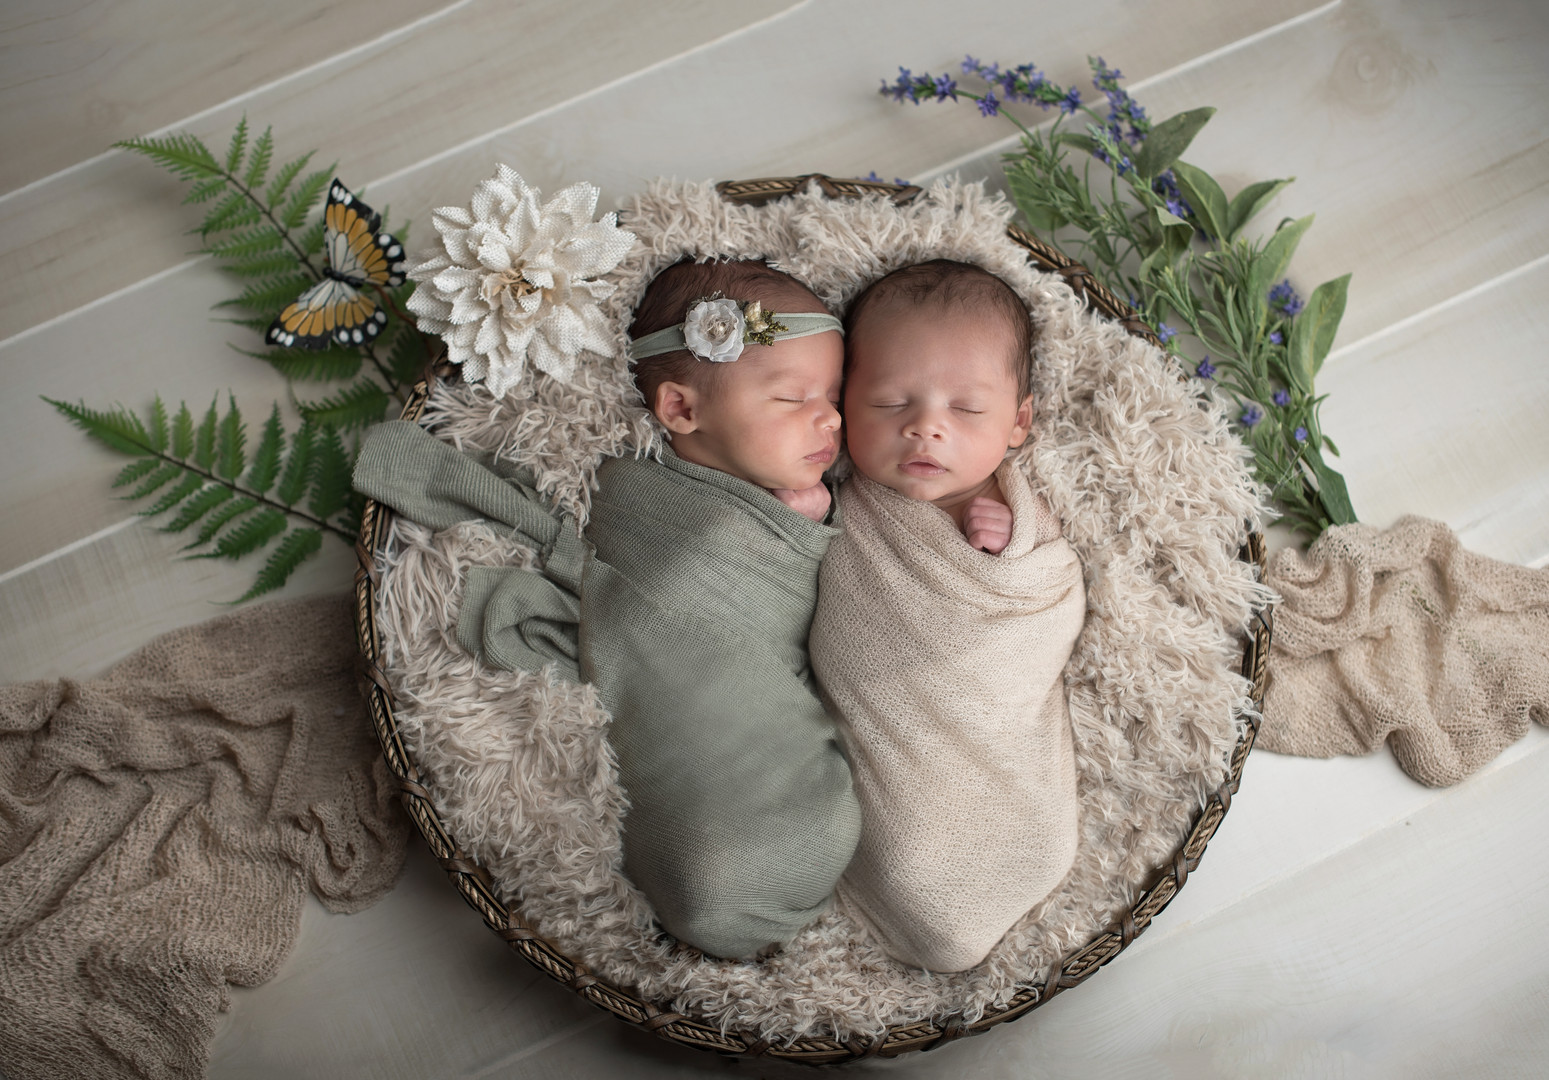 Newborn boy and girl